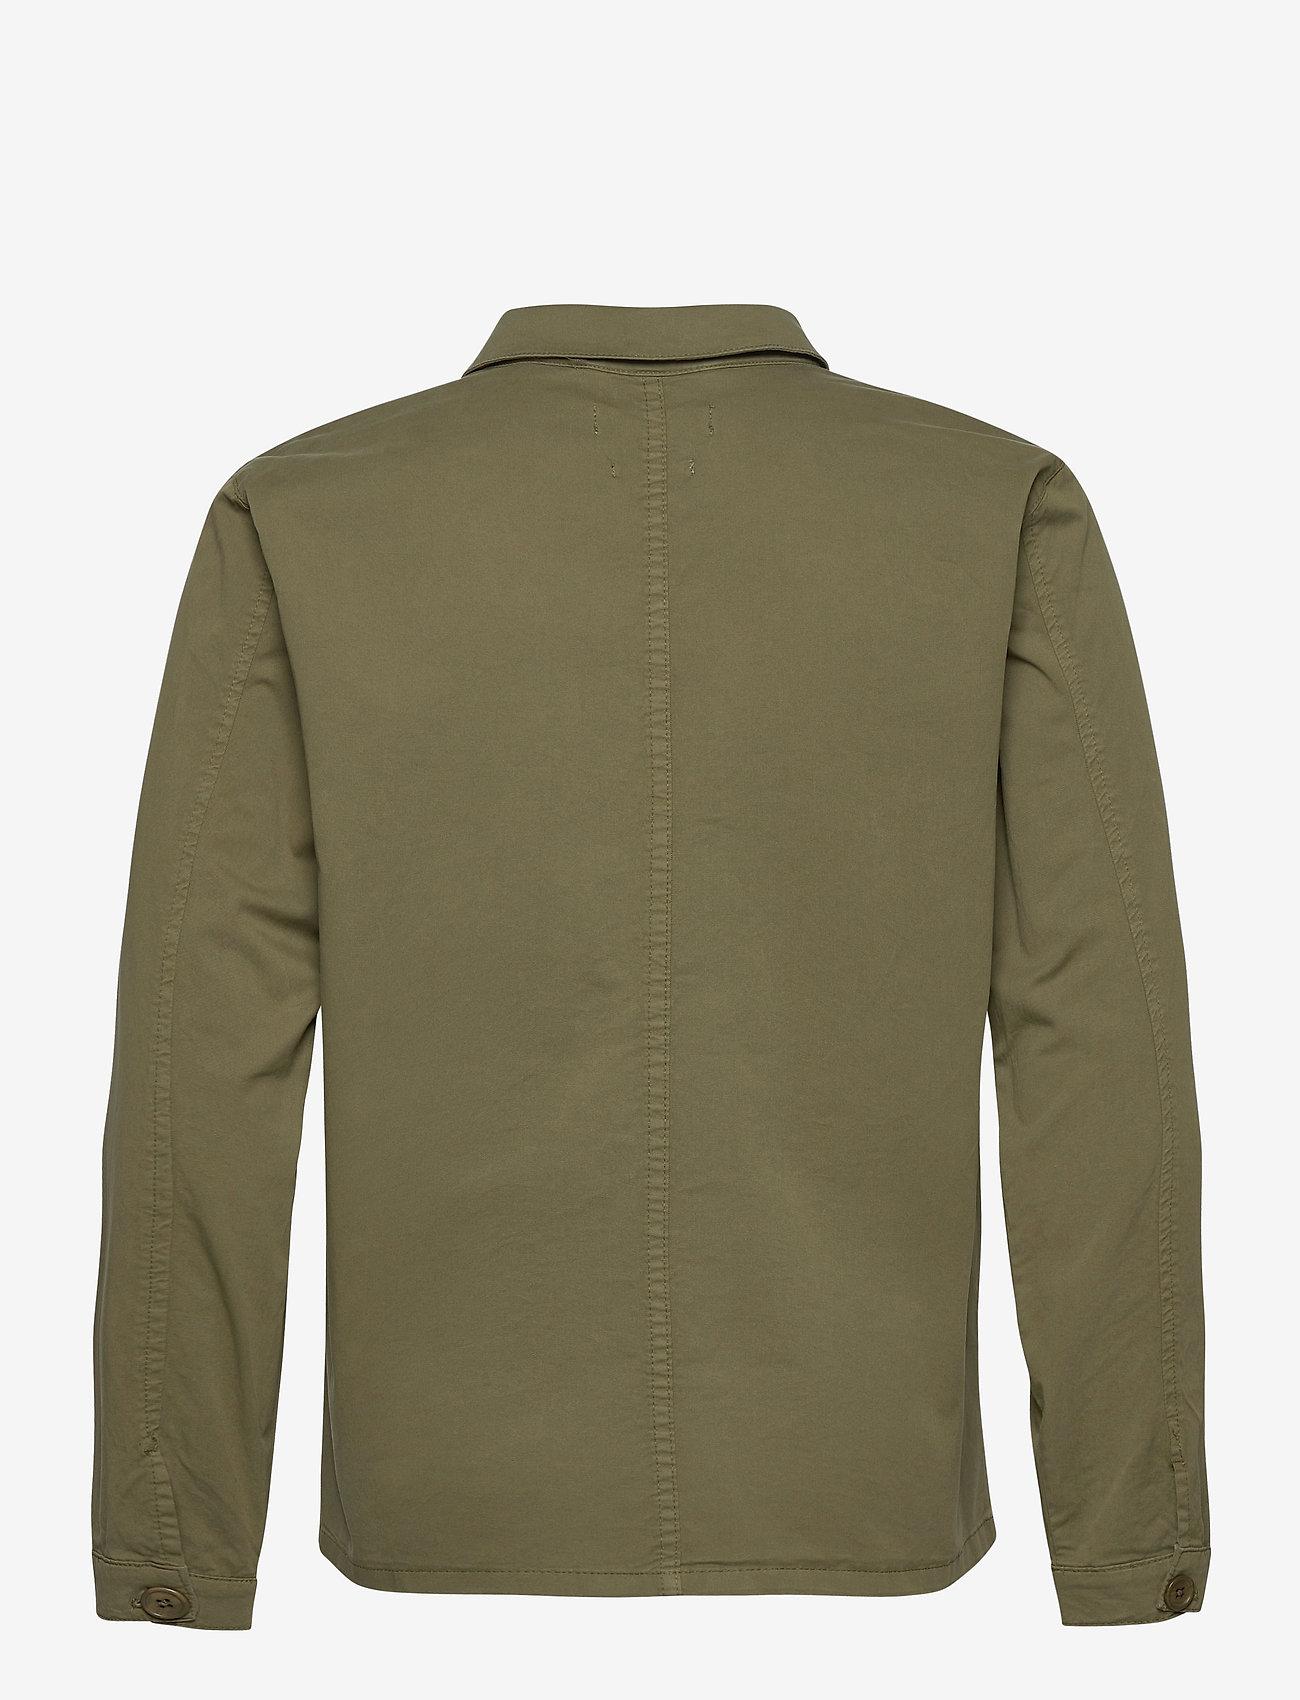 By Garment Makers - The Organic Workwear Jacket - vêtements - oil green - 2